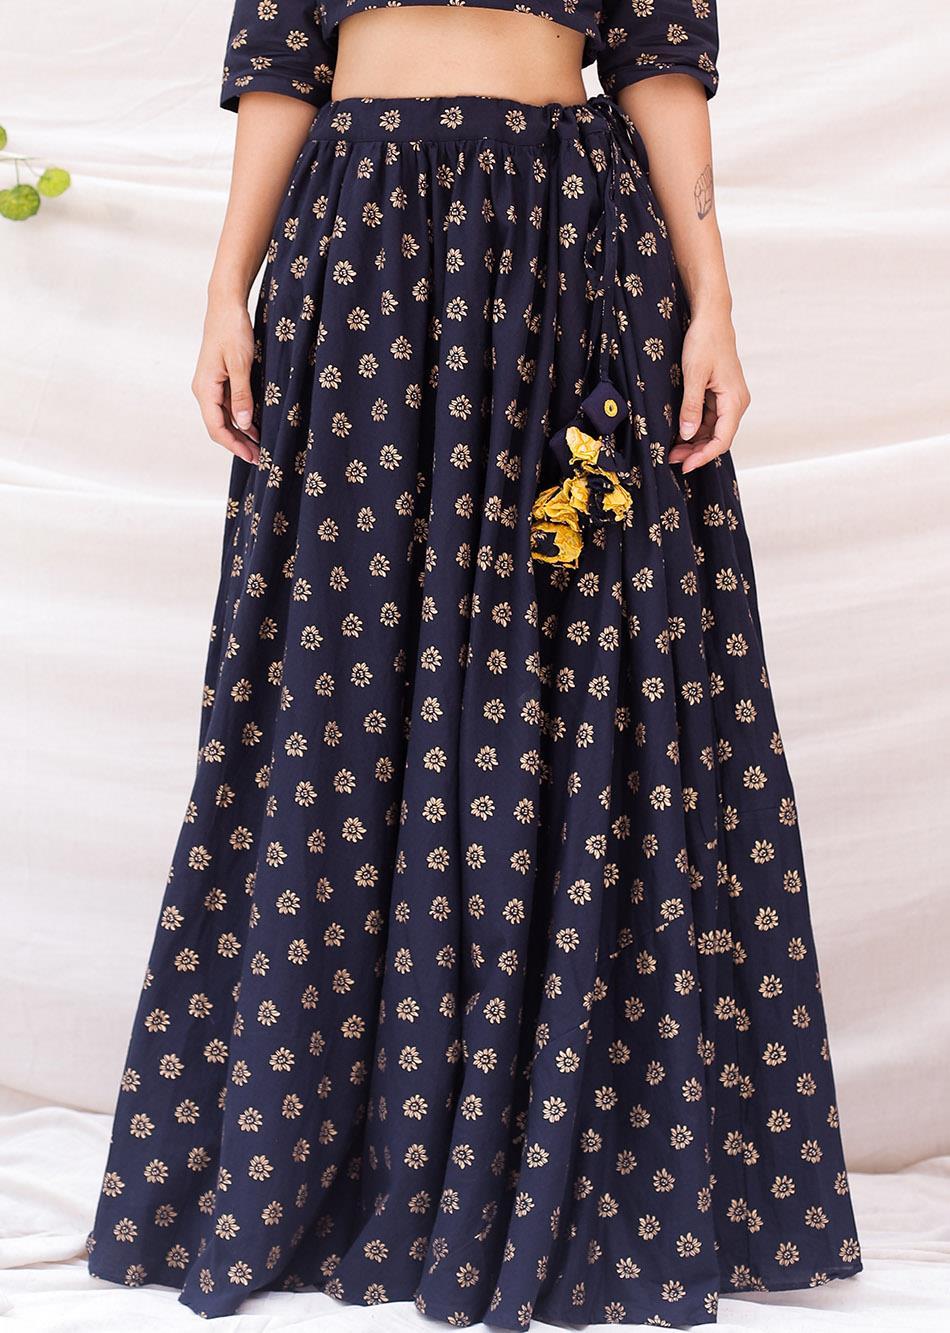 Gleaming look (Flowy Skirt) By Jovi Fashion